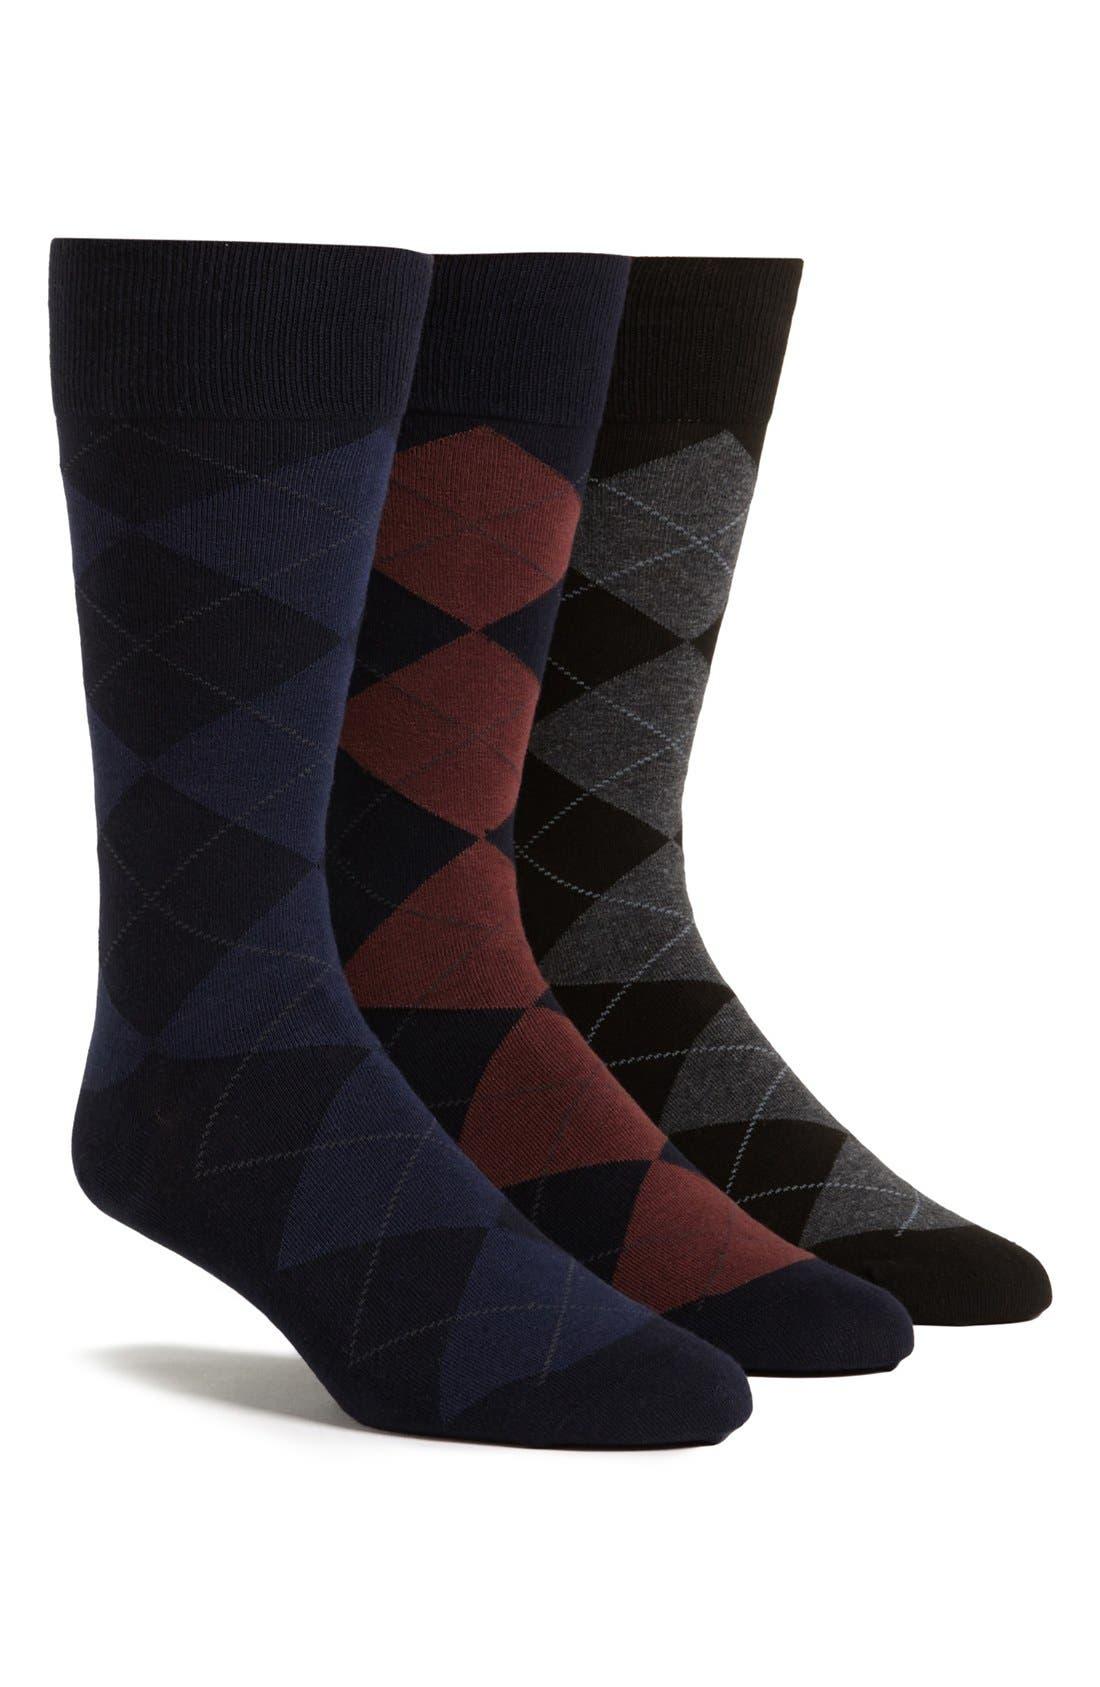 3-Pack Argyle Socks,                             Main thumbnail 1, color,                             NVY BURG/ NVY BLU/ BLK CHR